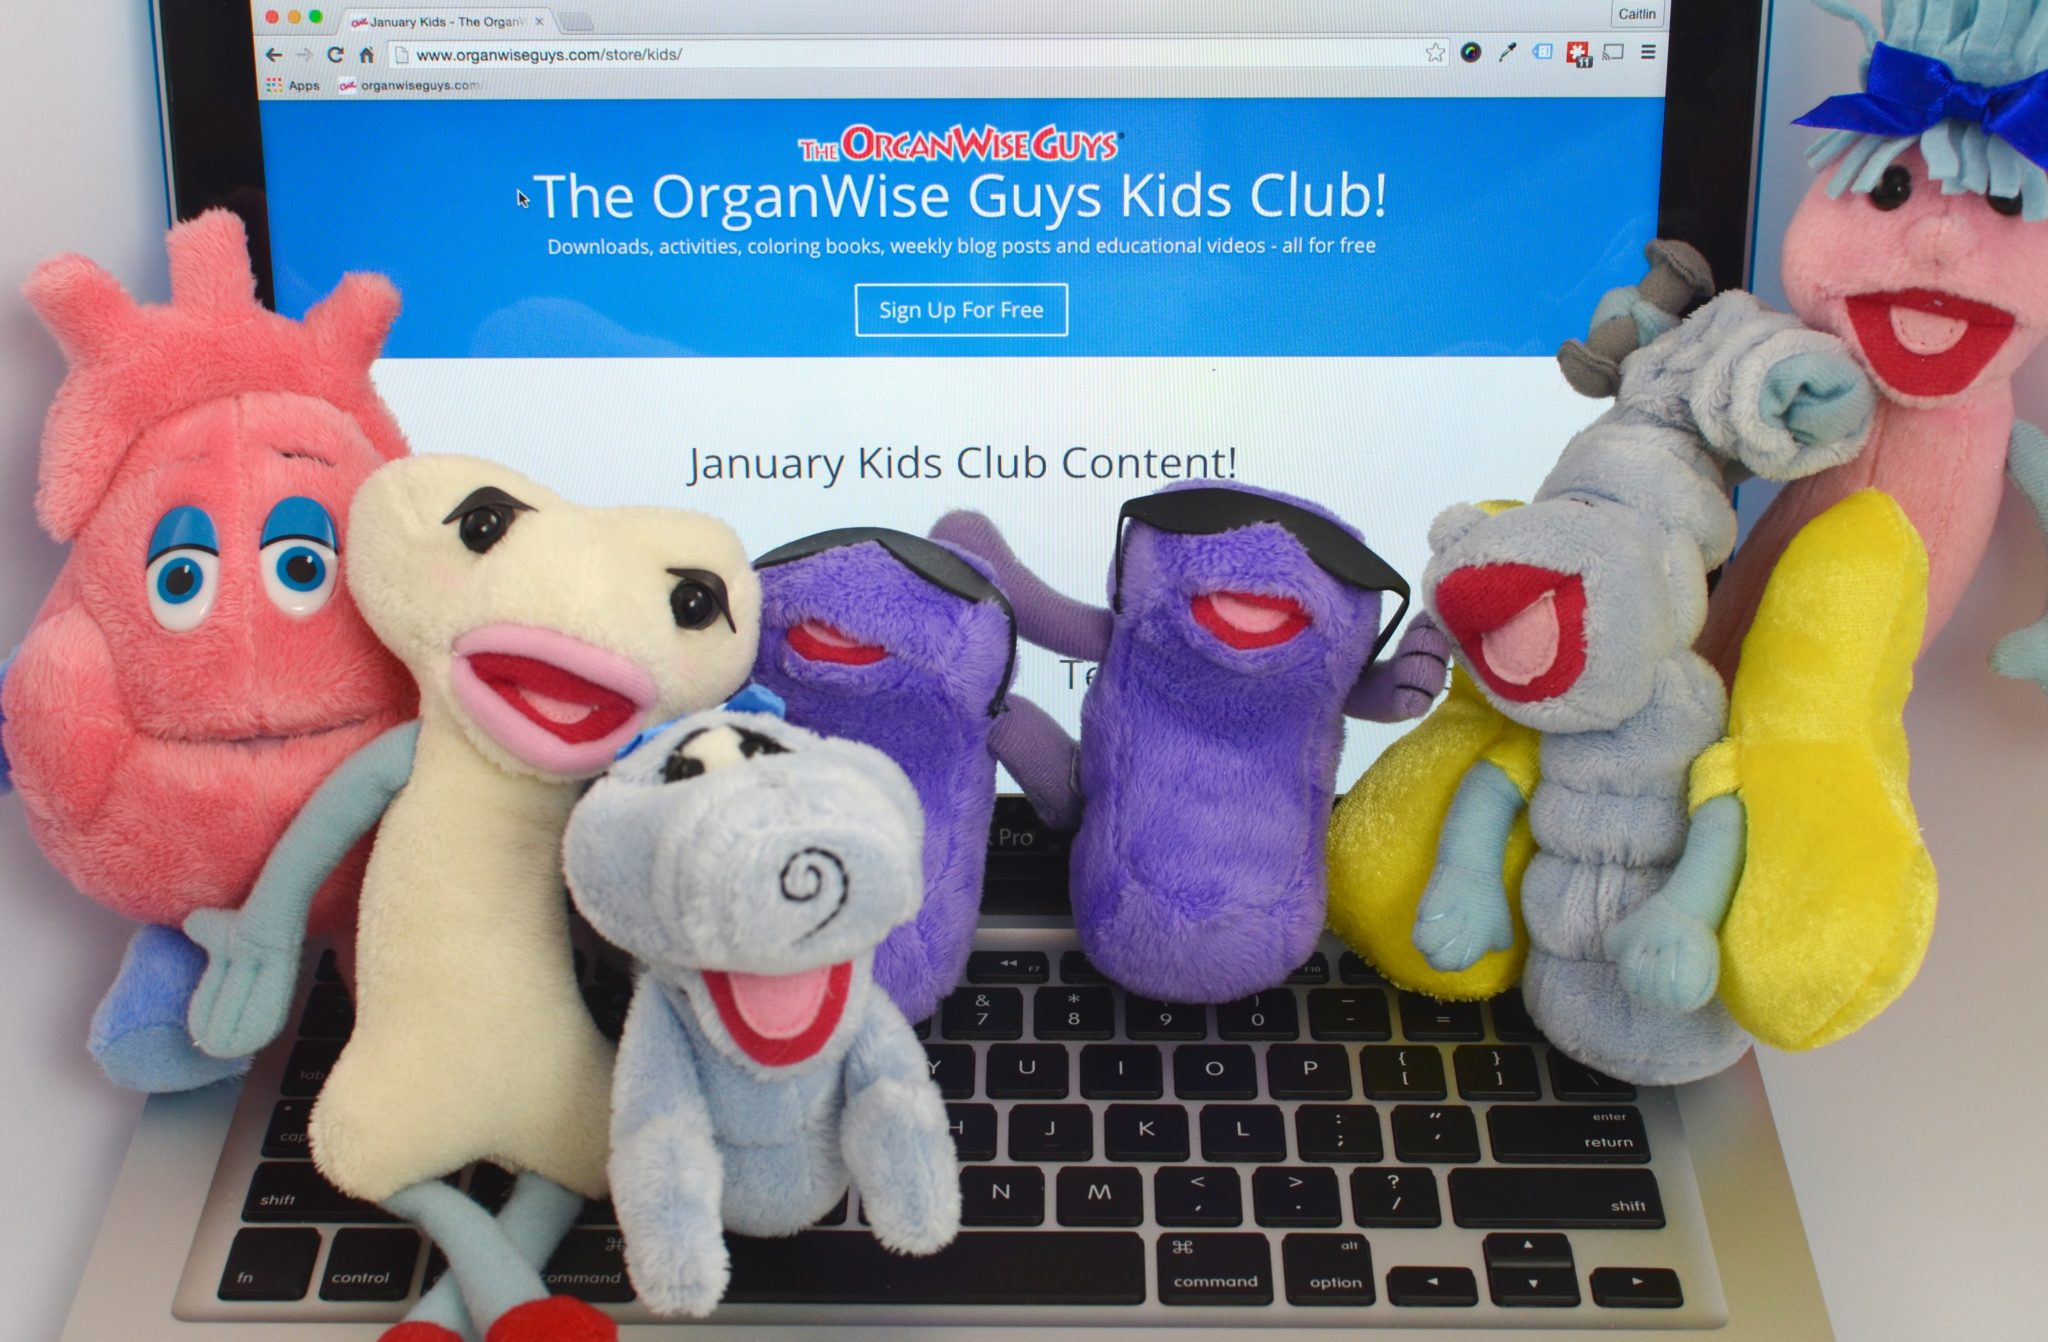 The OrganWise Guys Kids Club Image[1]